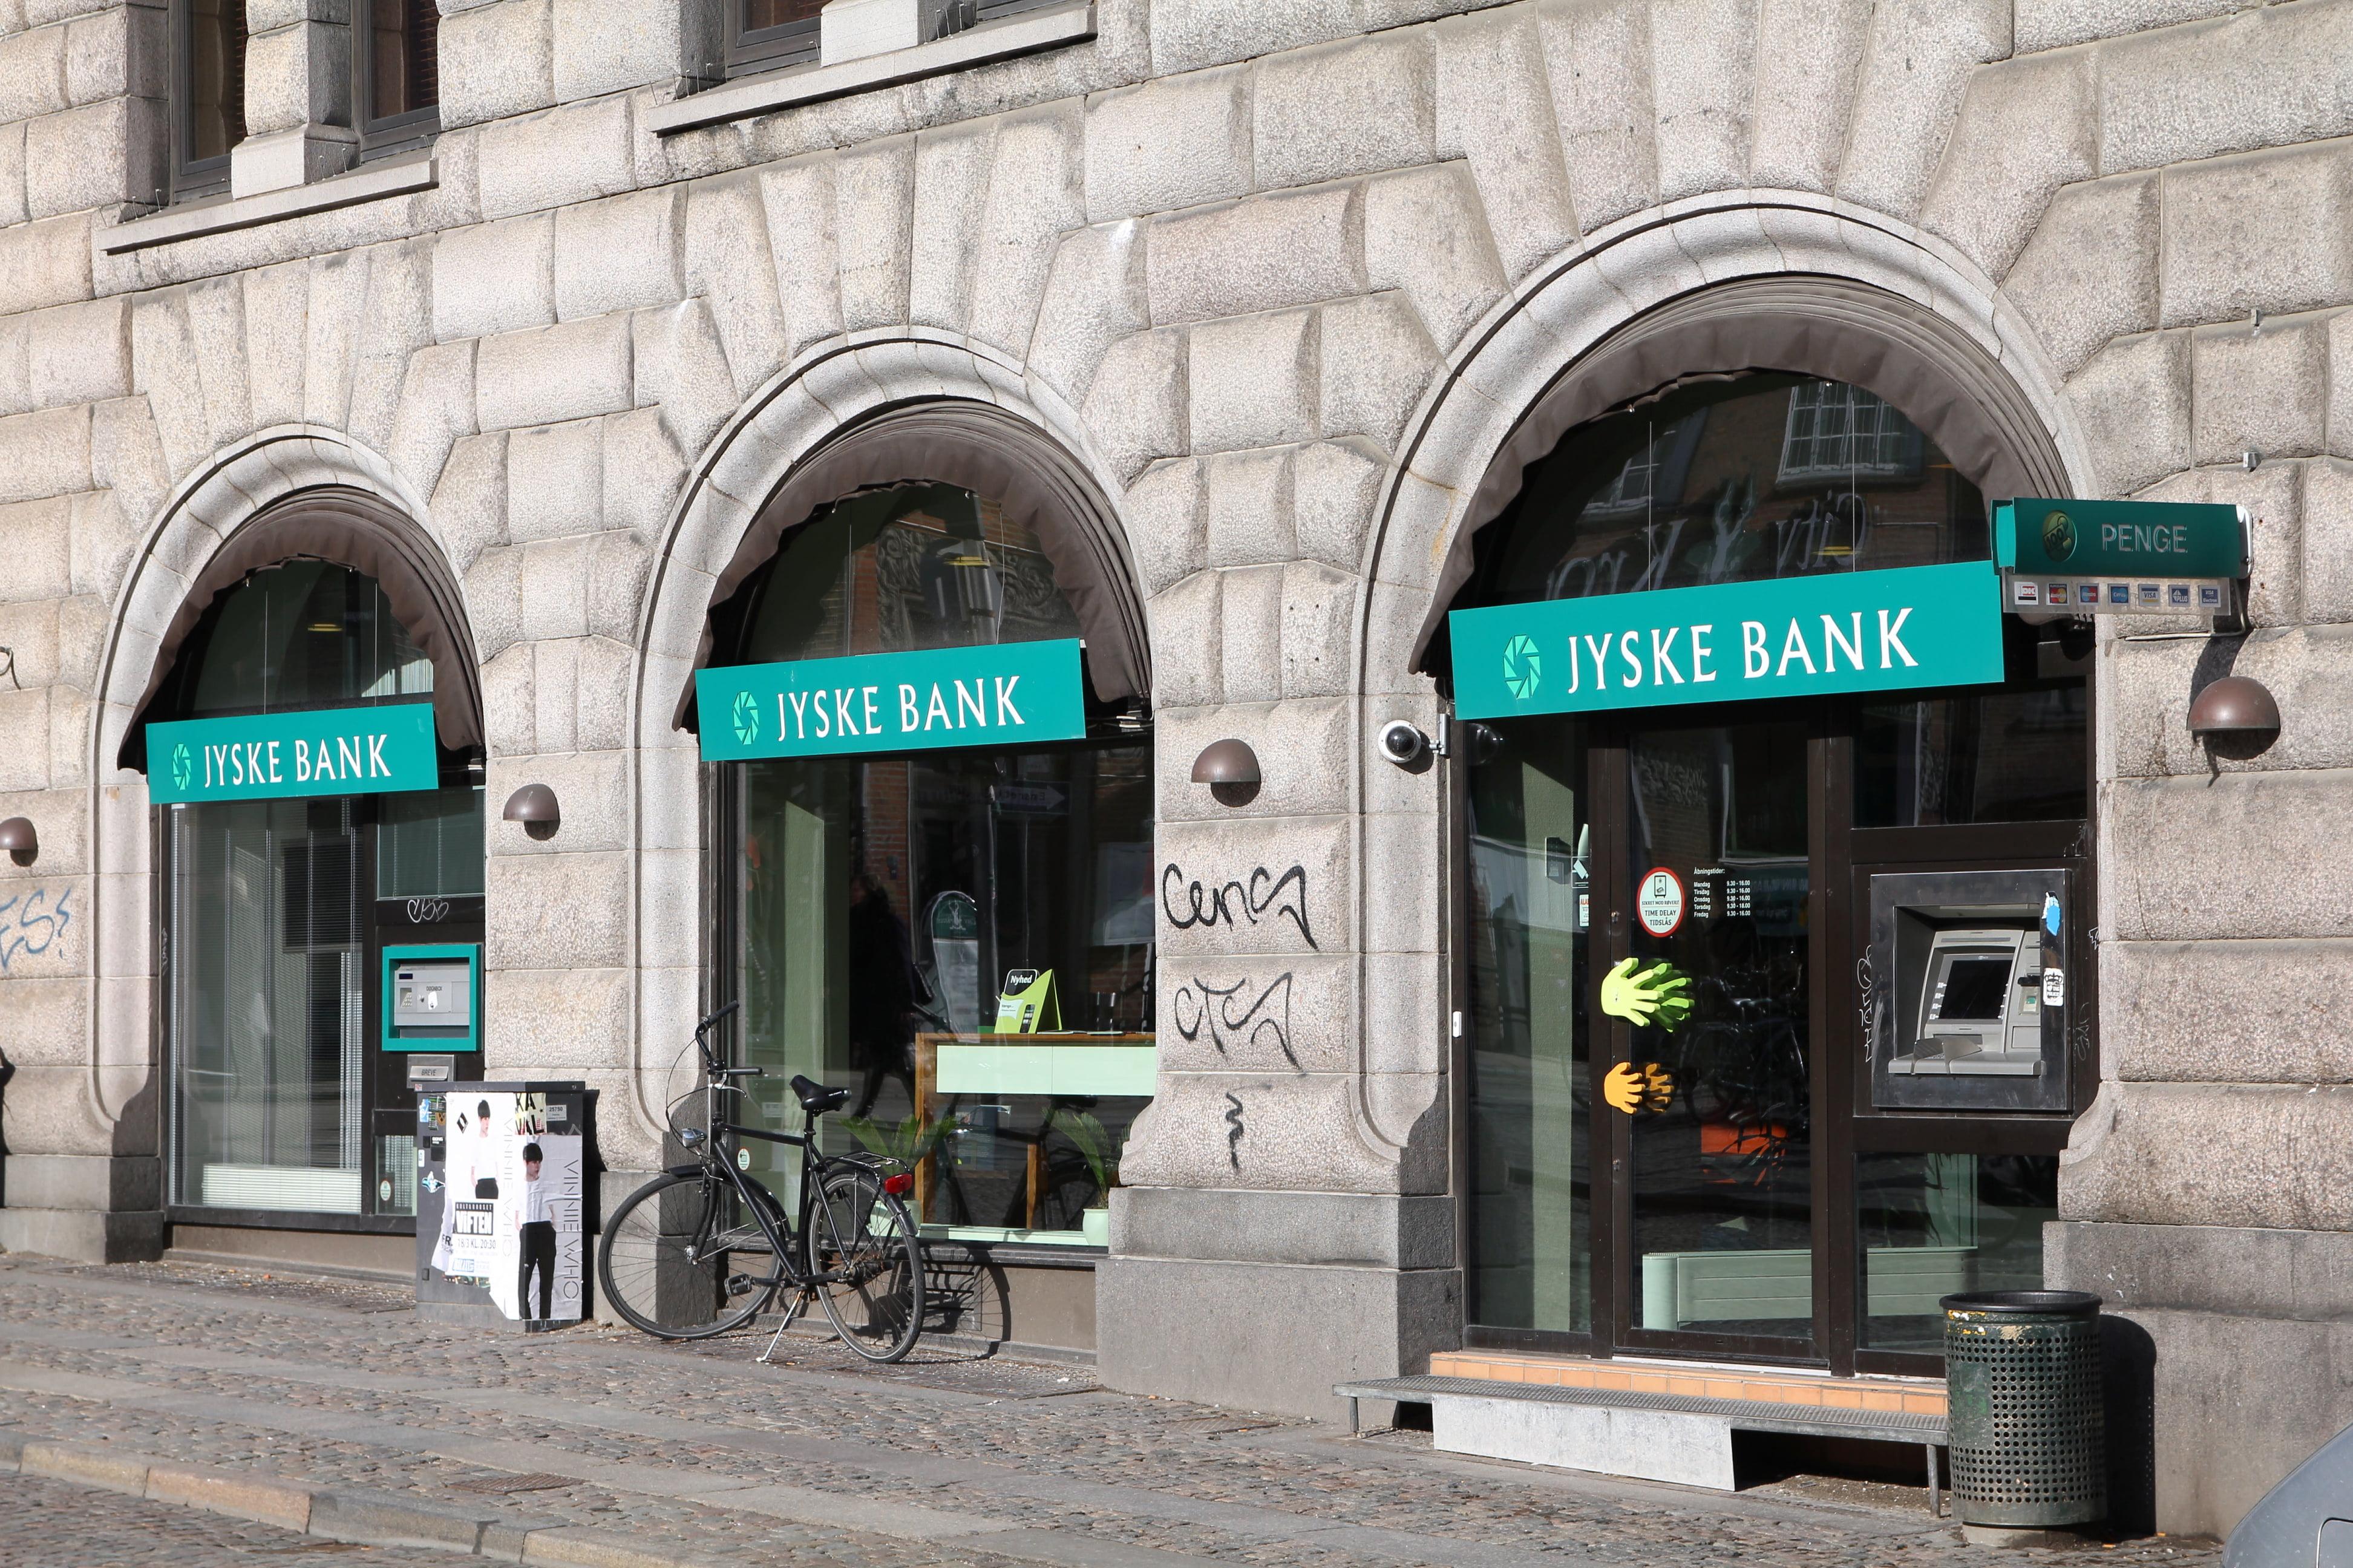 Jyske Bank stimulating the economy with cheap lending